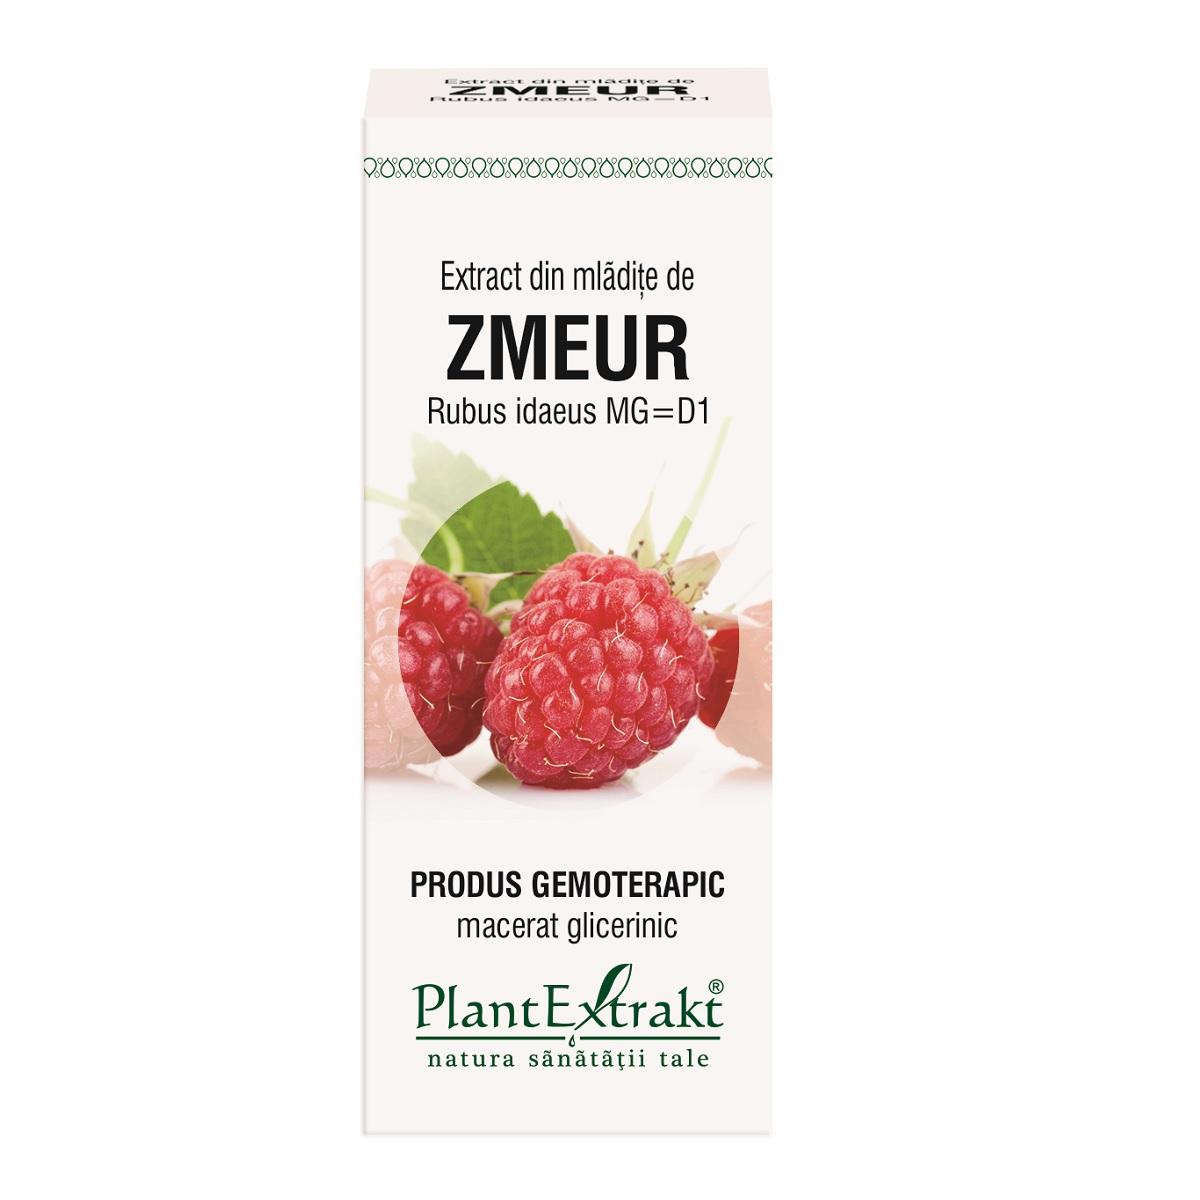 Extract din mlădițe de Zmeur, 50 ml, Plant Extrakt